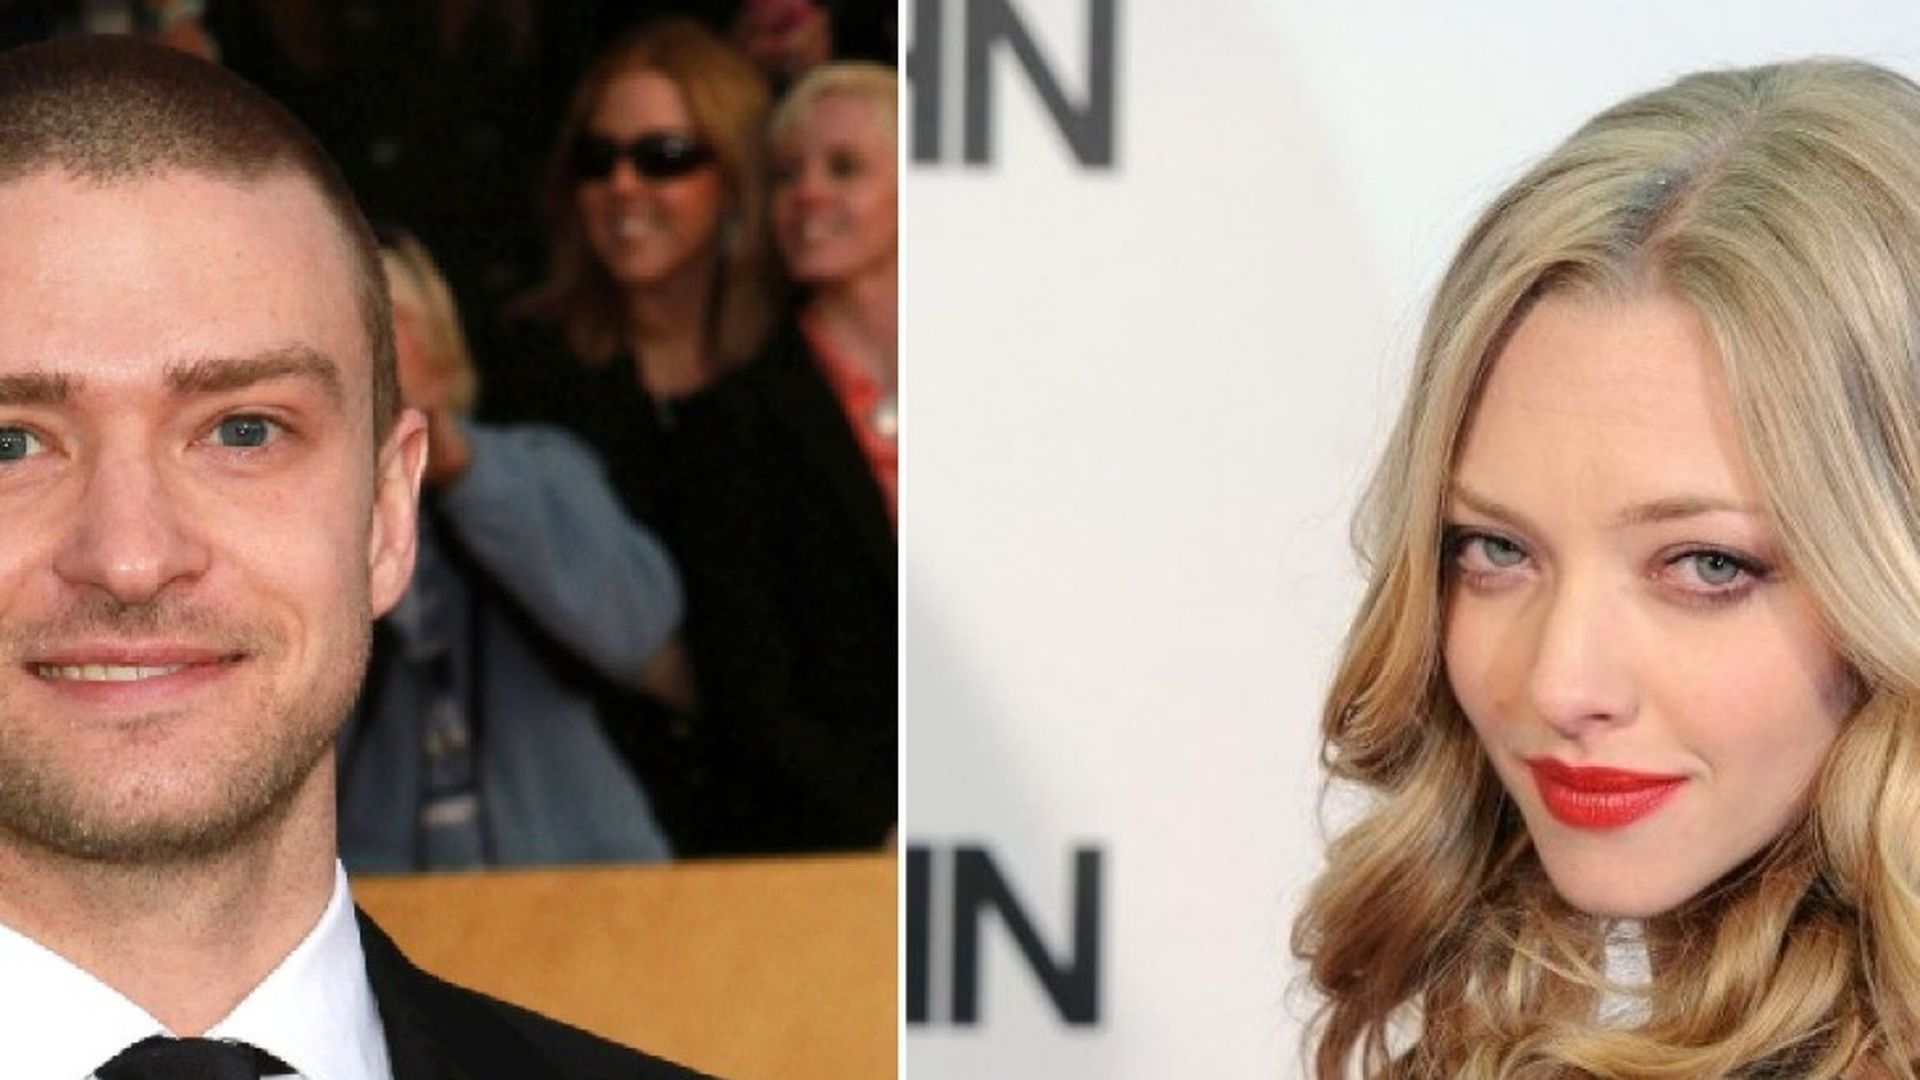 Amanda Seyfried In Time - Justin Timberlake And Amanda